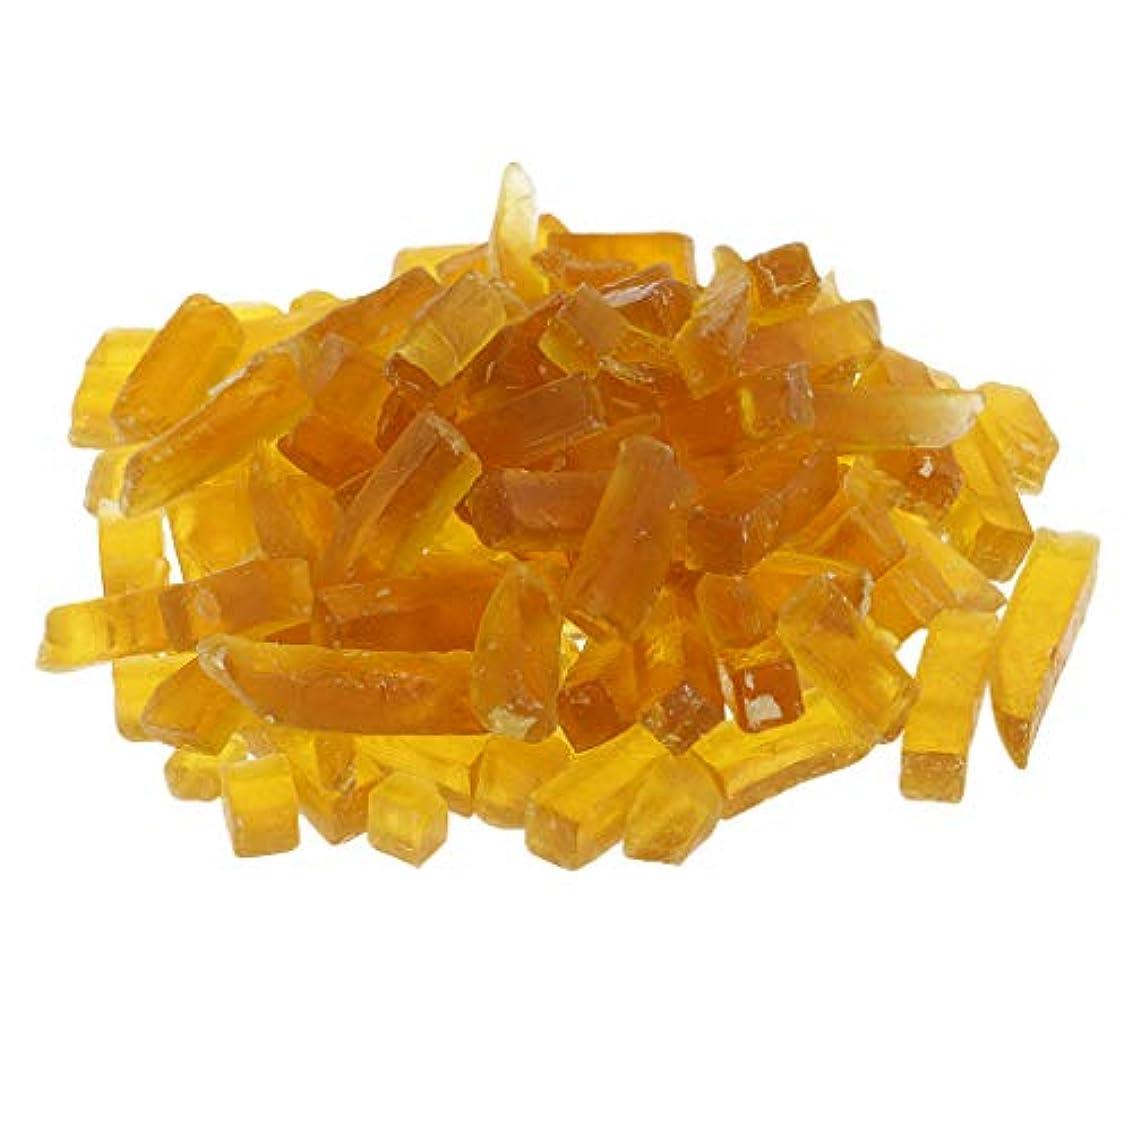 Perfeclan 溶融植物 石鹸 石鹸用 天然植物 石けん ソープベース 250g イエロー